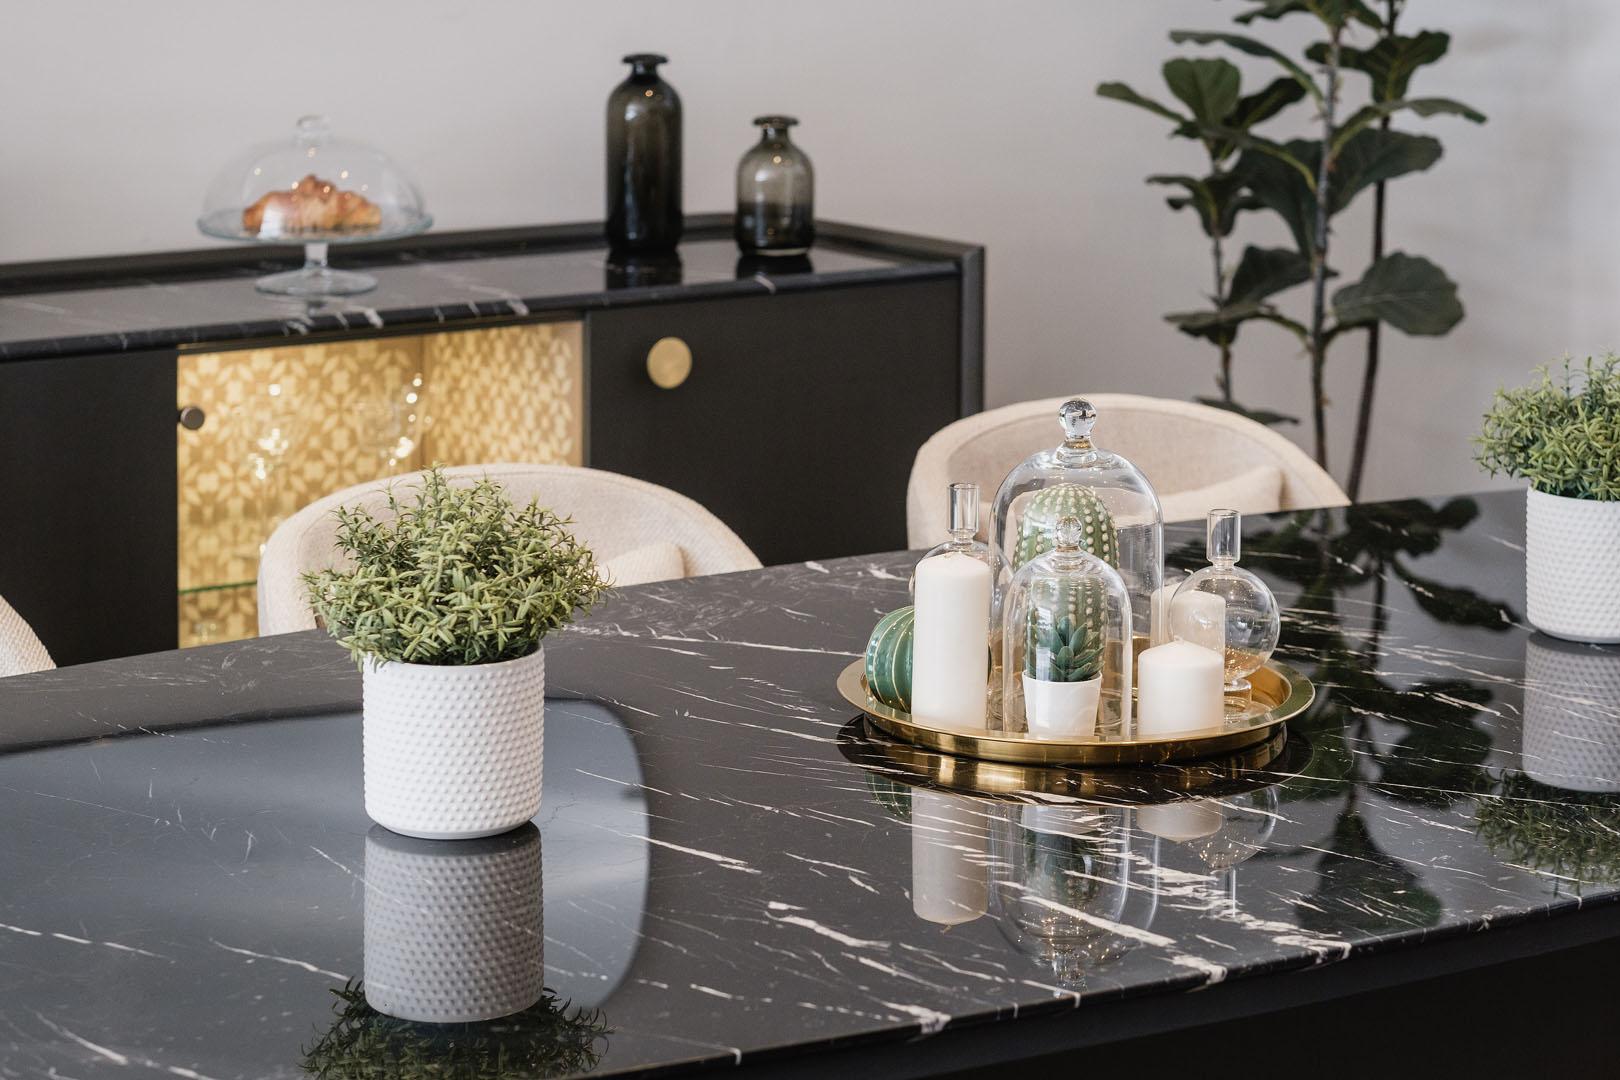 Lazurde dining - Pinocchio furniture